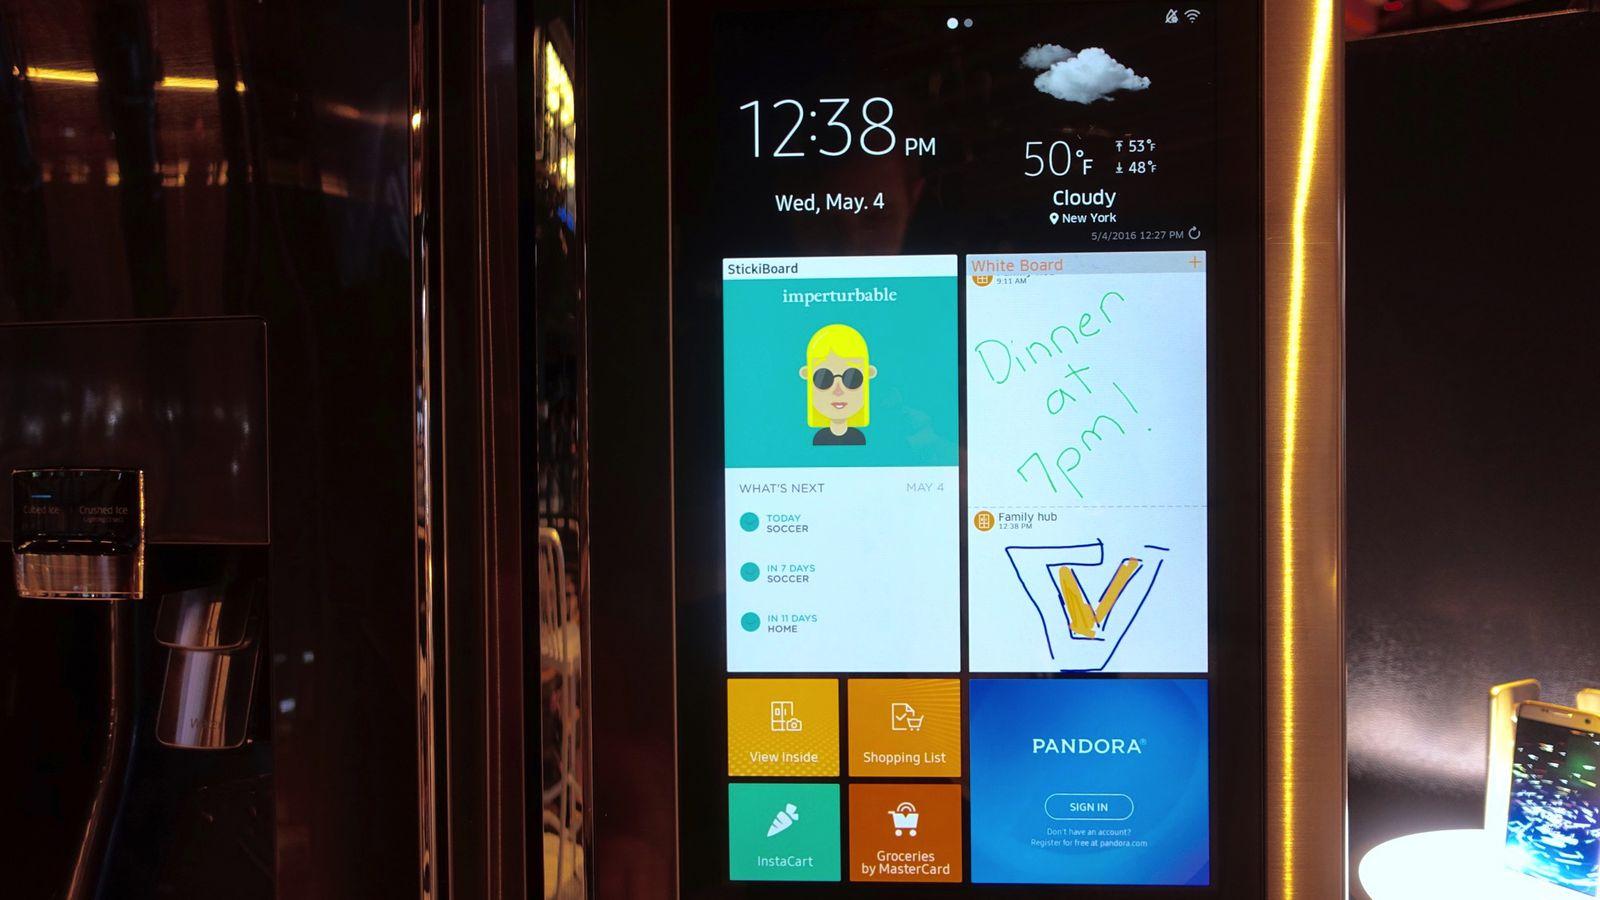 Samsung S Family Hub Smart Fridge Is Ridiculous Wonderful